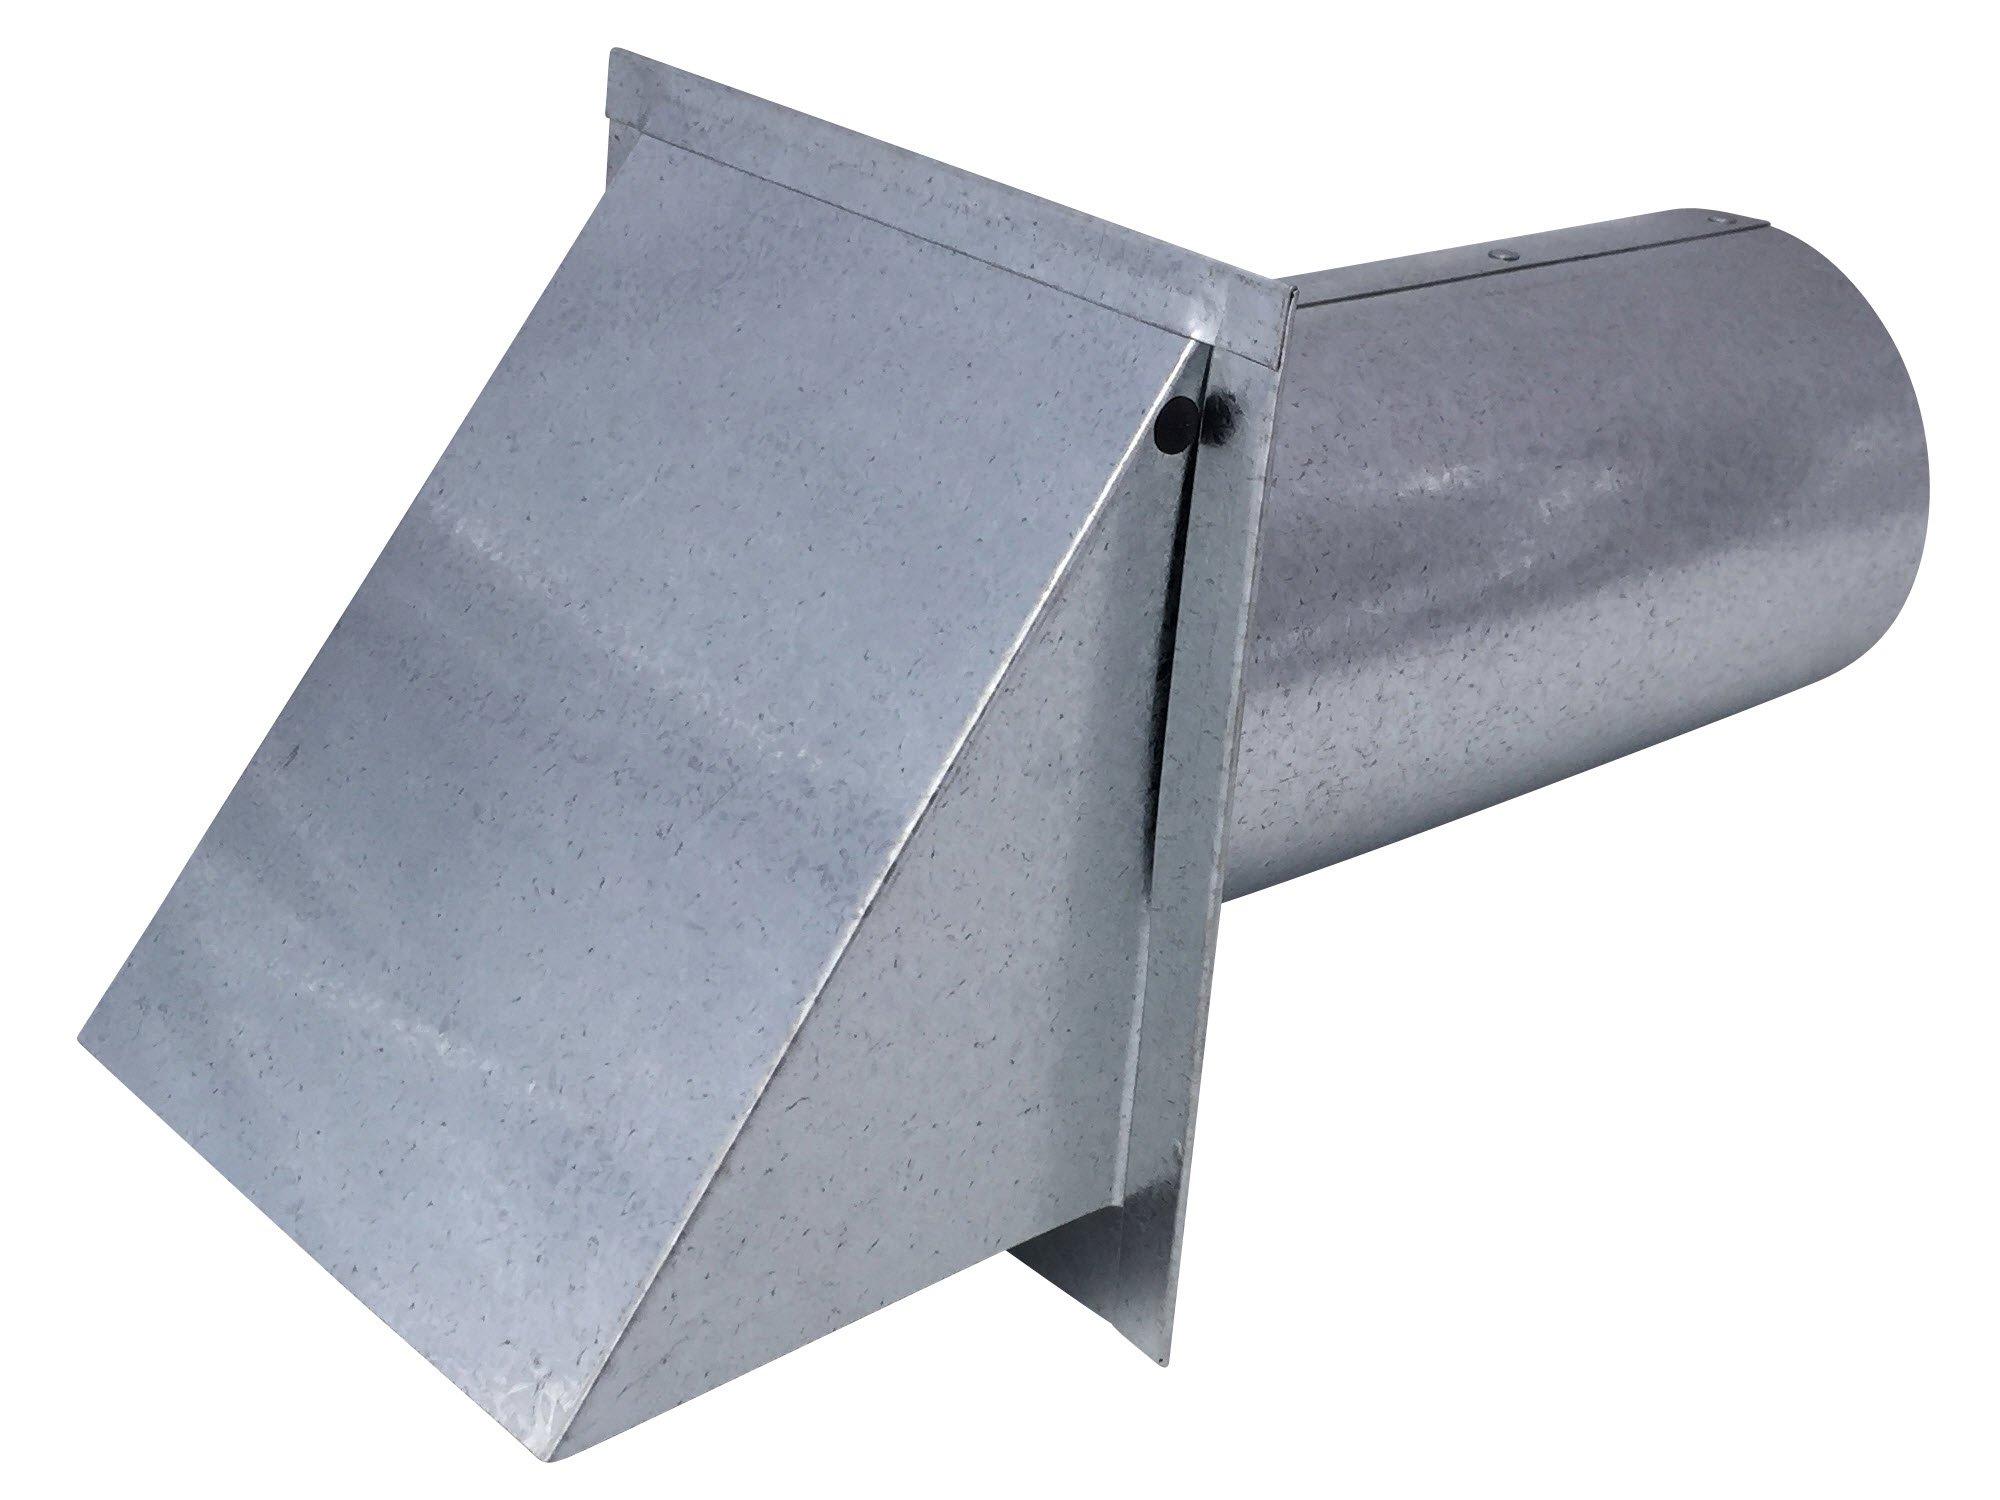 Dryer Wall Vent Galvanized Steel (Standard 4 Inch Diameter Exhaust) - Vent Works